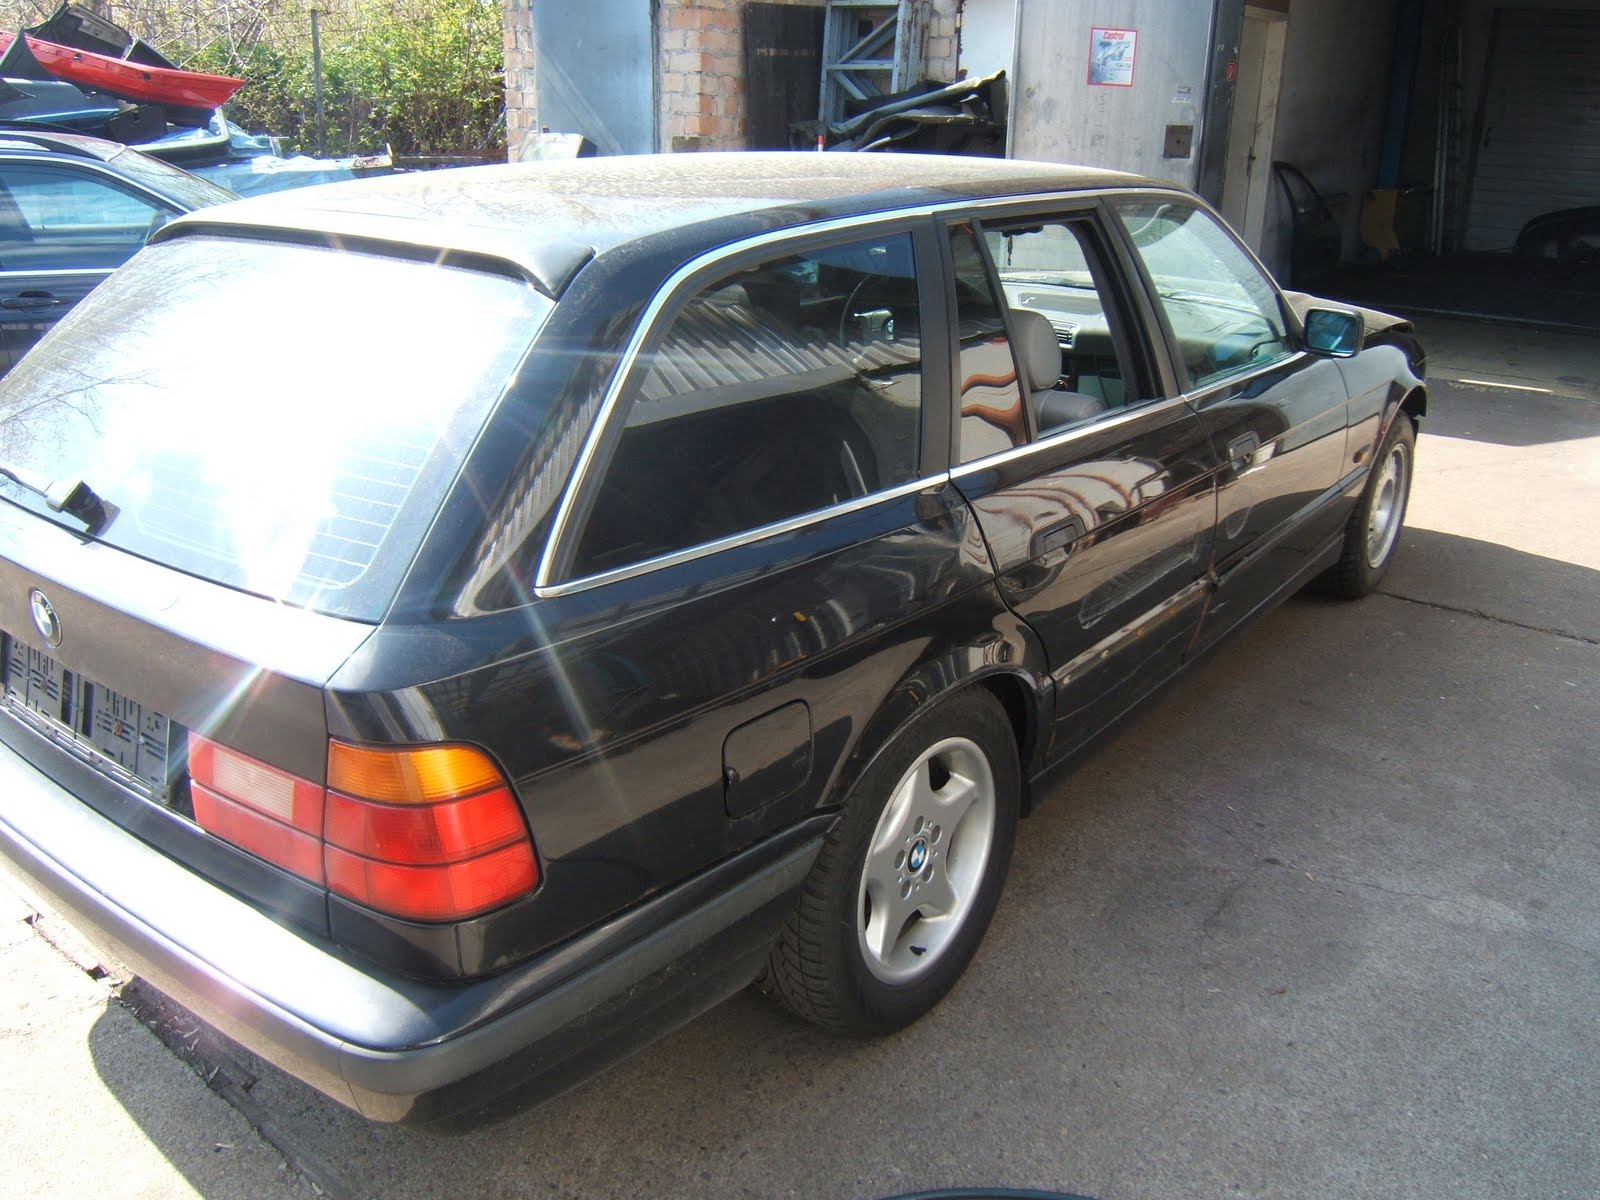 325i Limo 1993 Schaltwagen-4.bp.blogspot.com